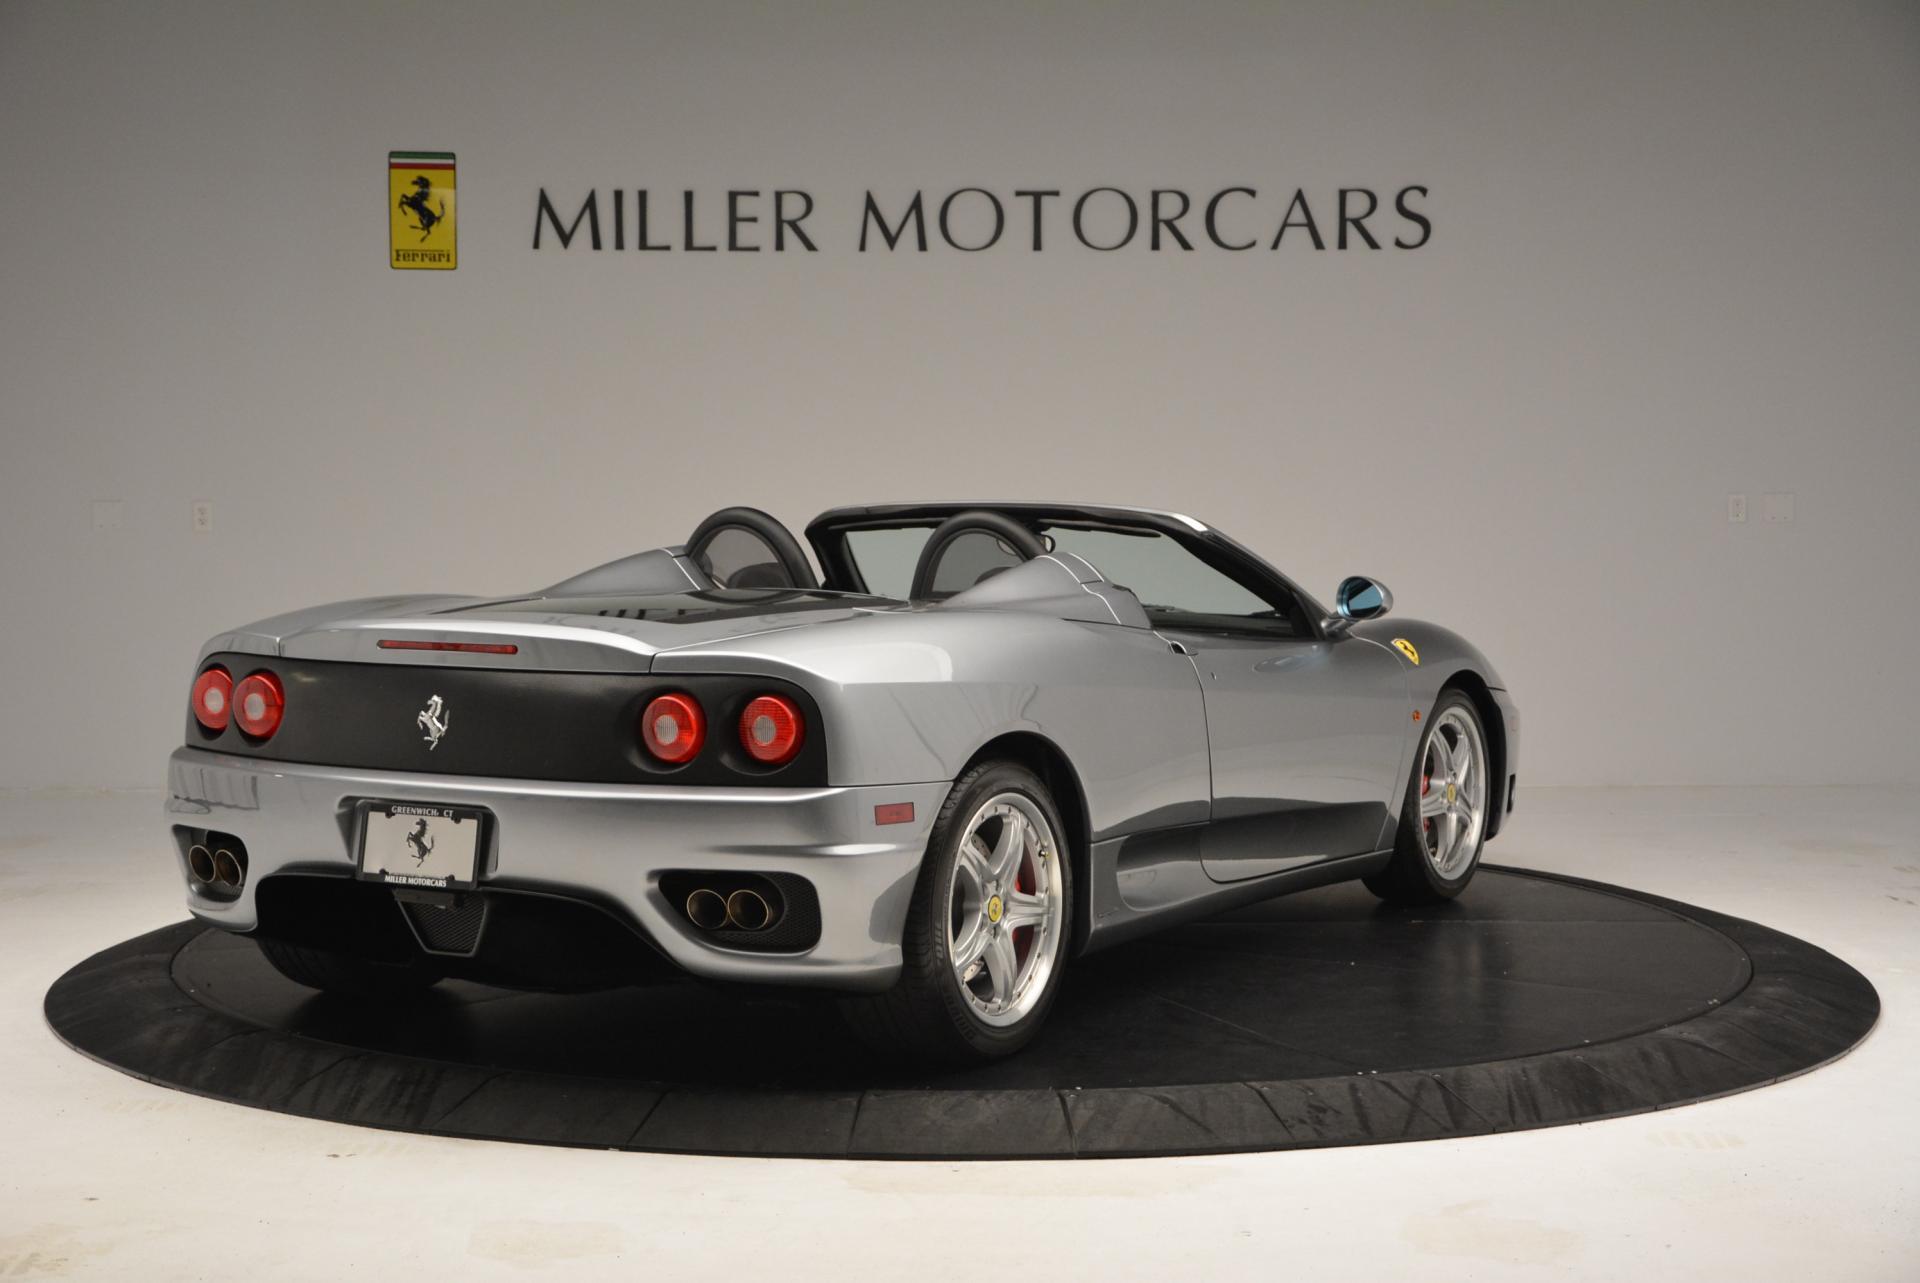 Used 2004 Ferrari 360 Spider 6-Speed Manual  For Sale In Greenwich, CT. Alfa Romeo of Greenwich, 4317 138_p7